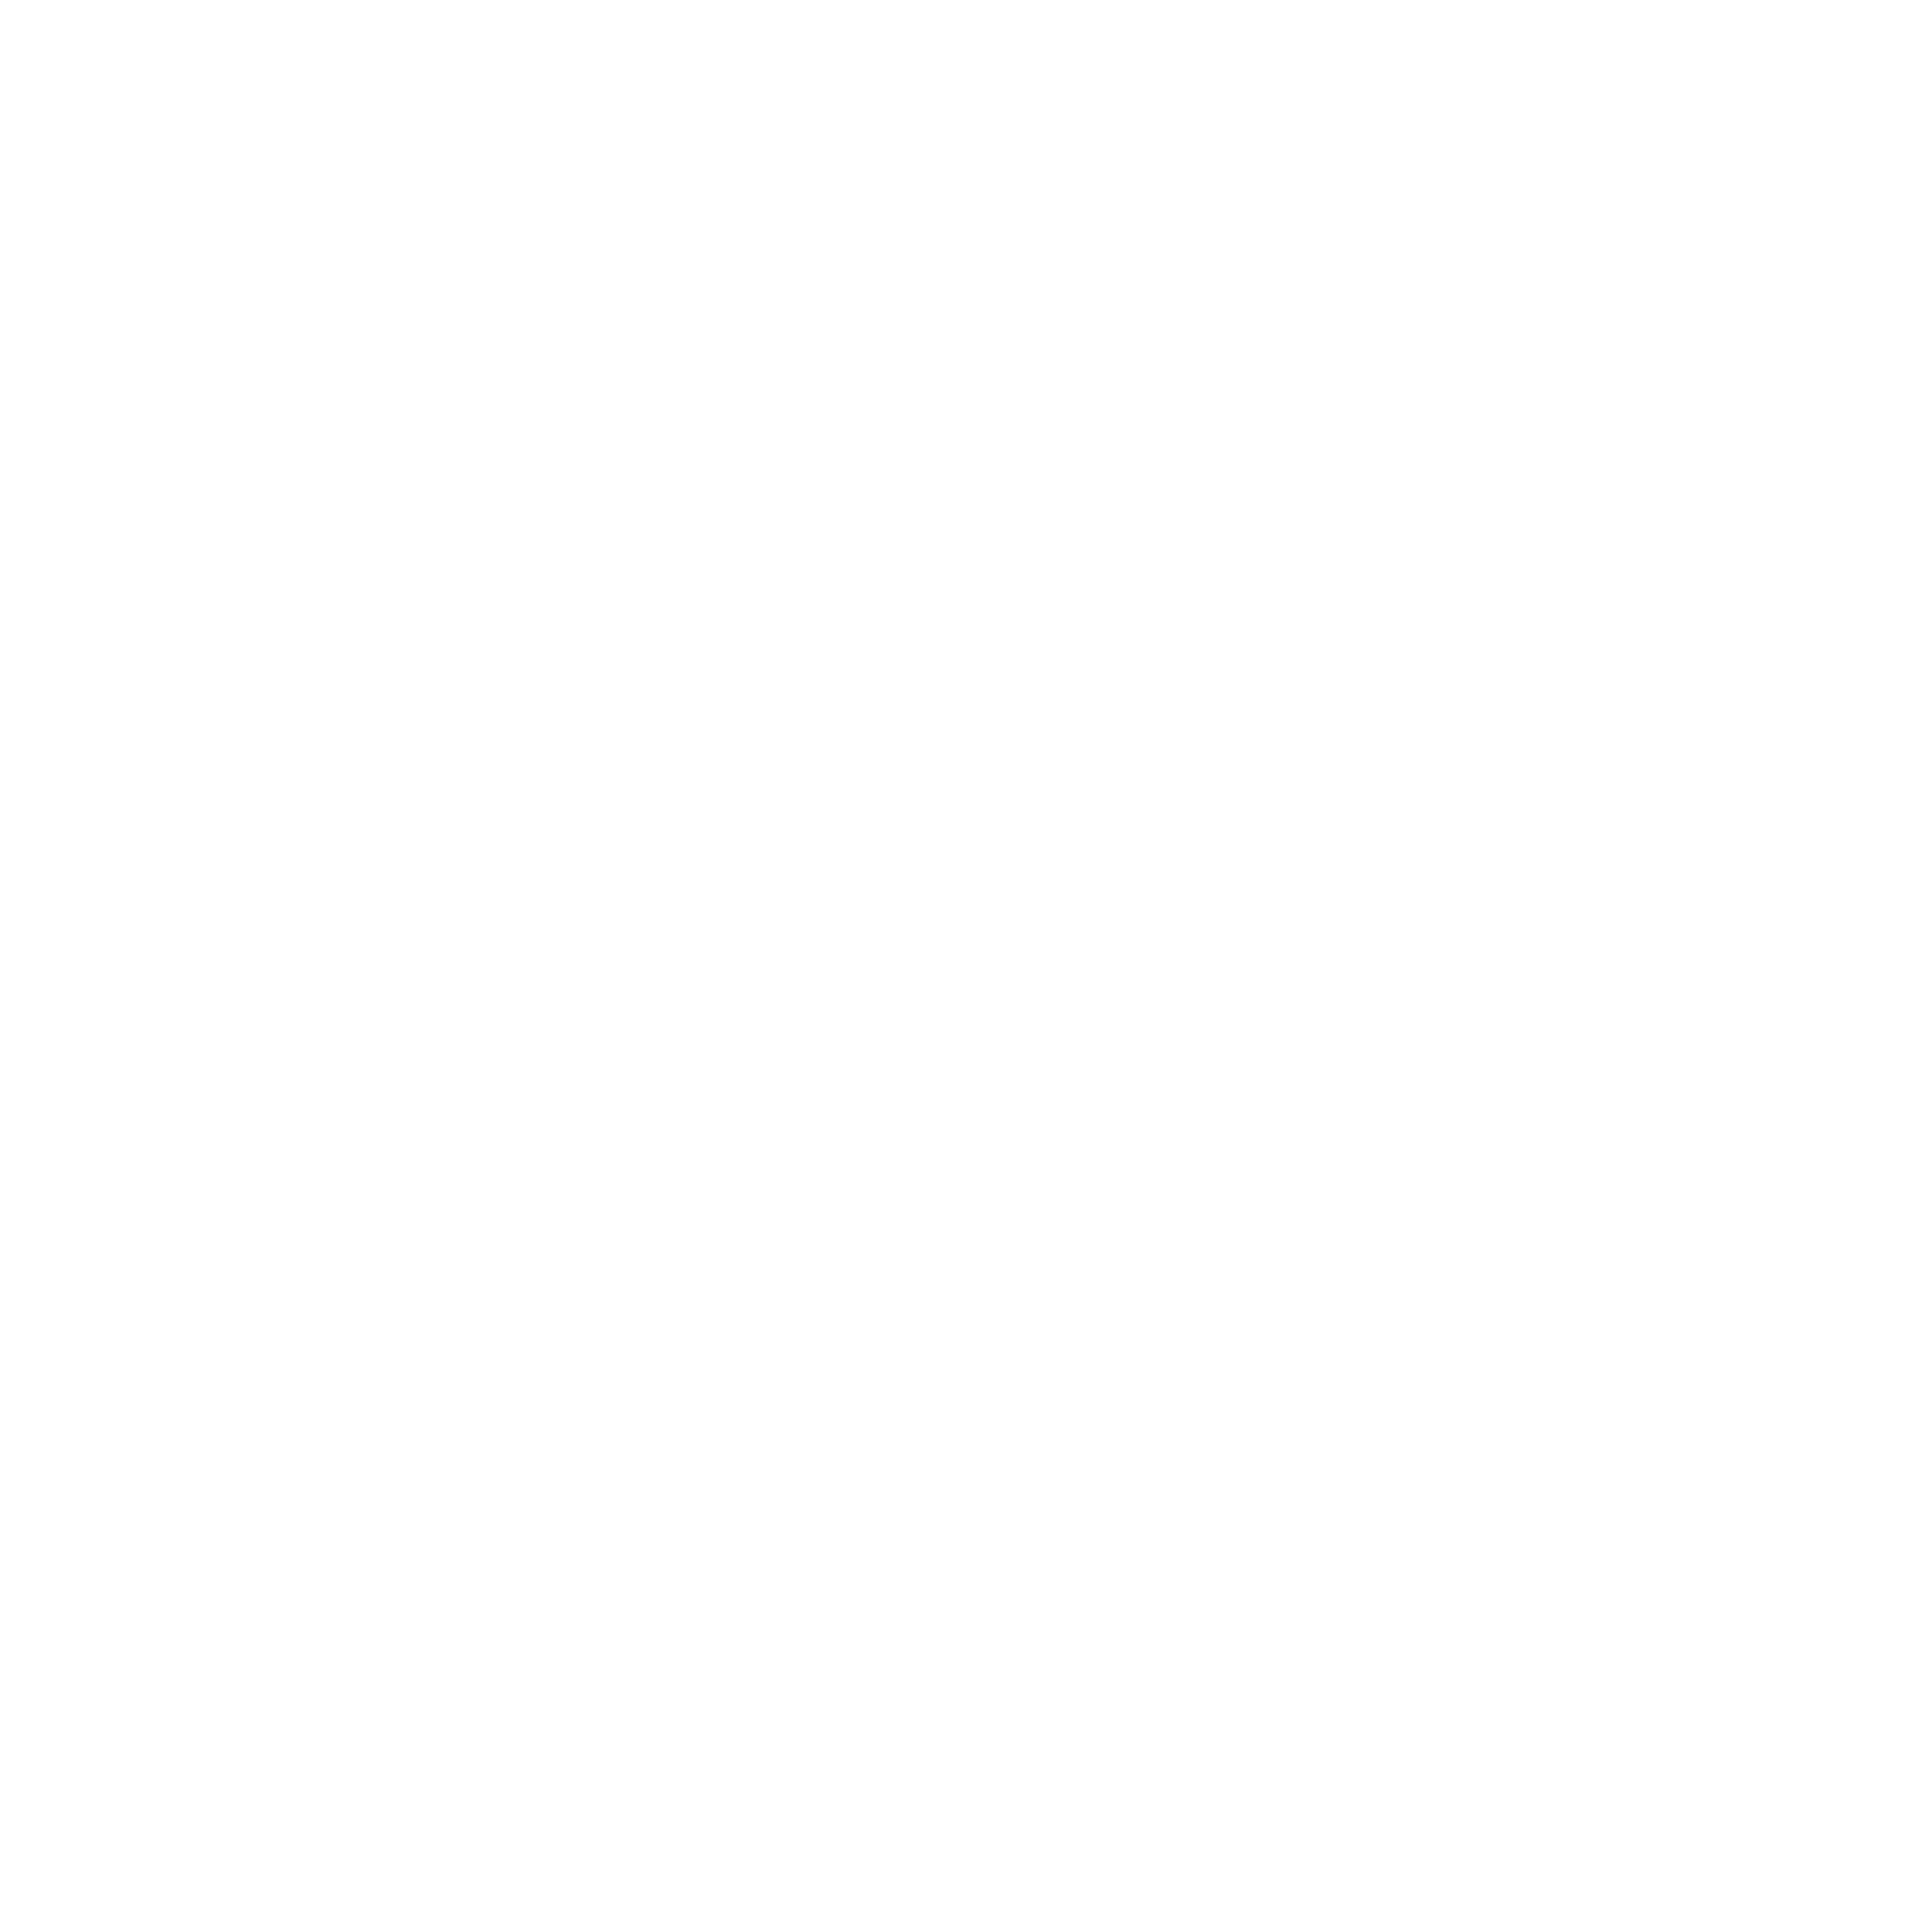 1000 Truck-01